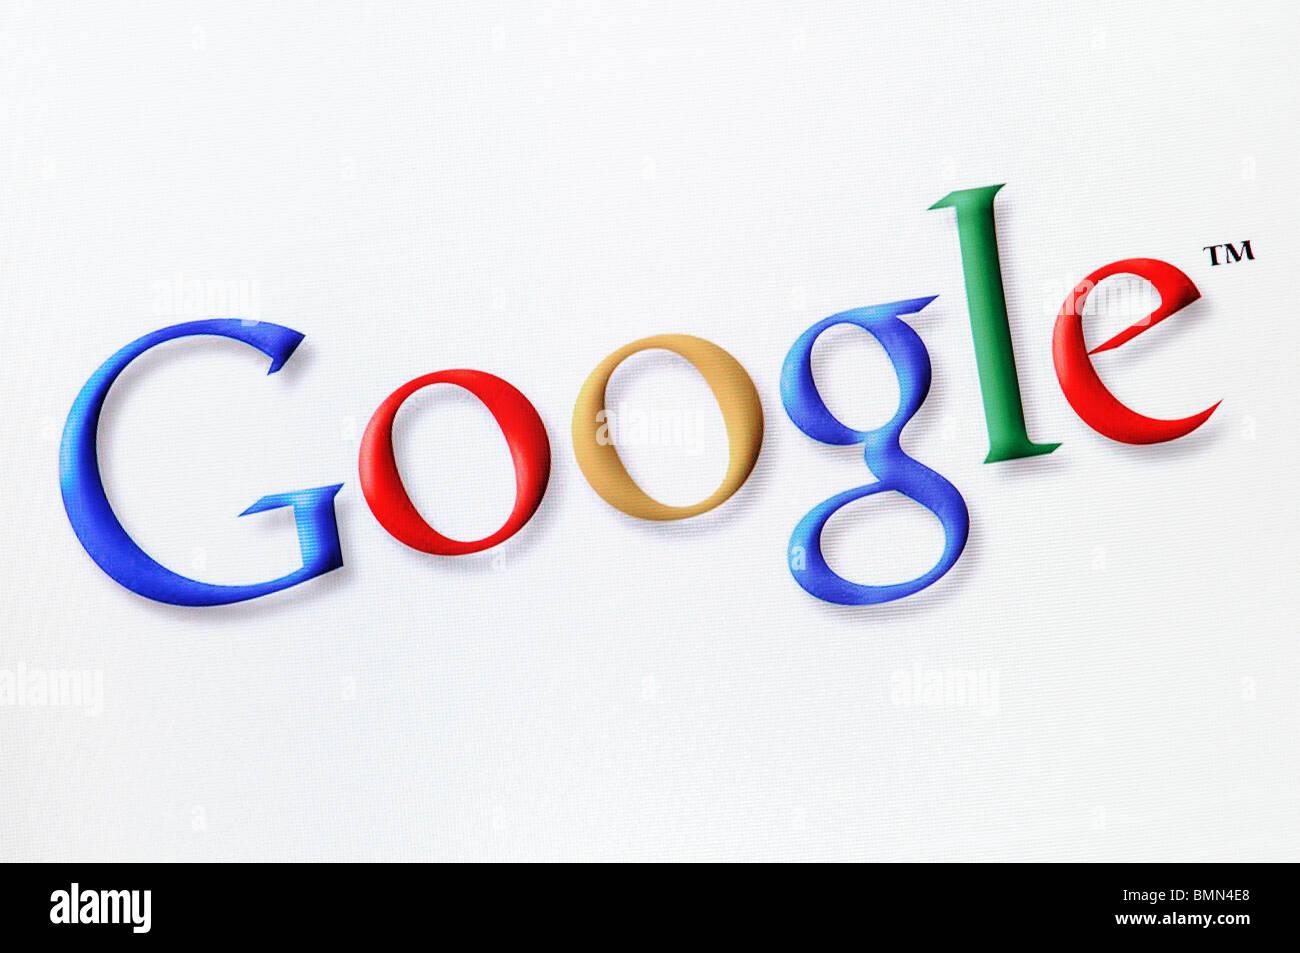 Google Search Engine Screenshot - Stock Image